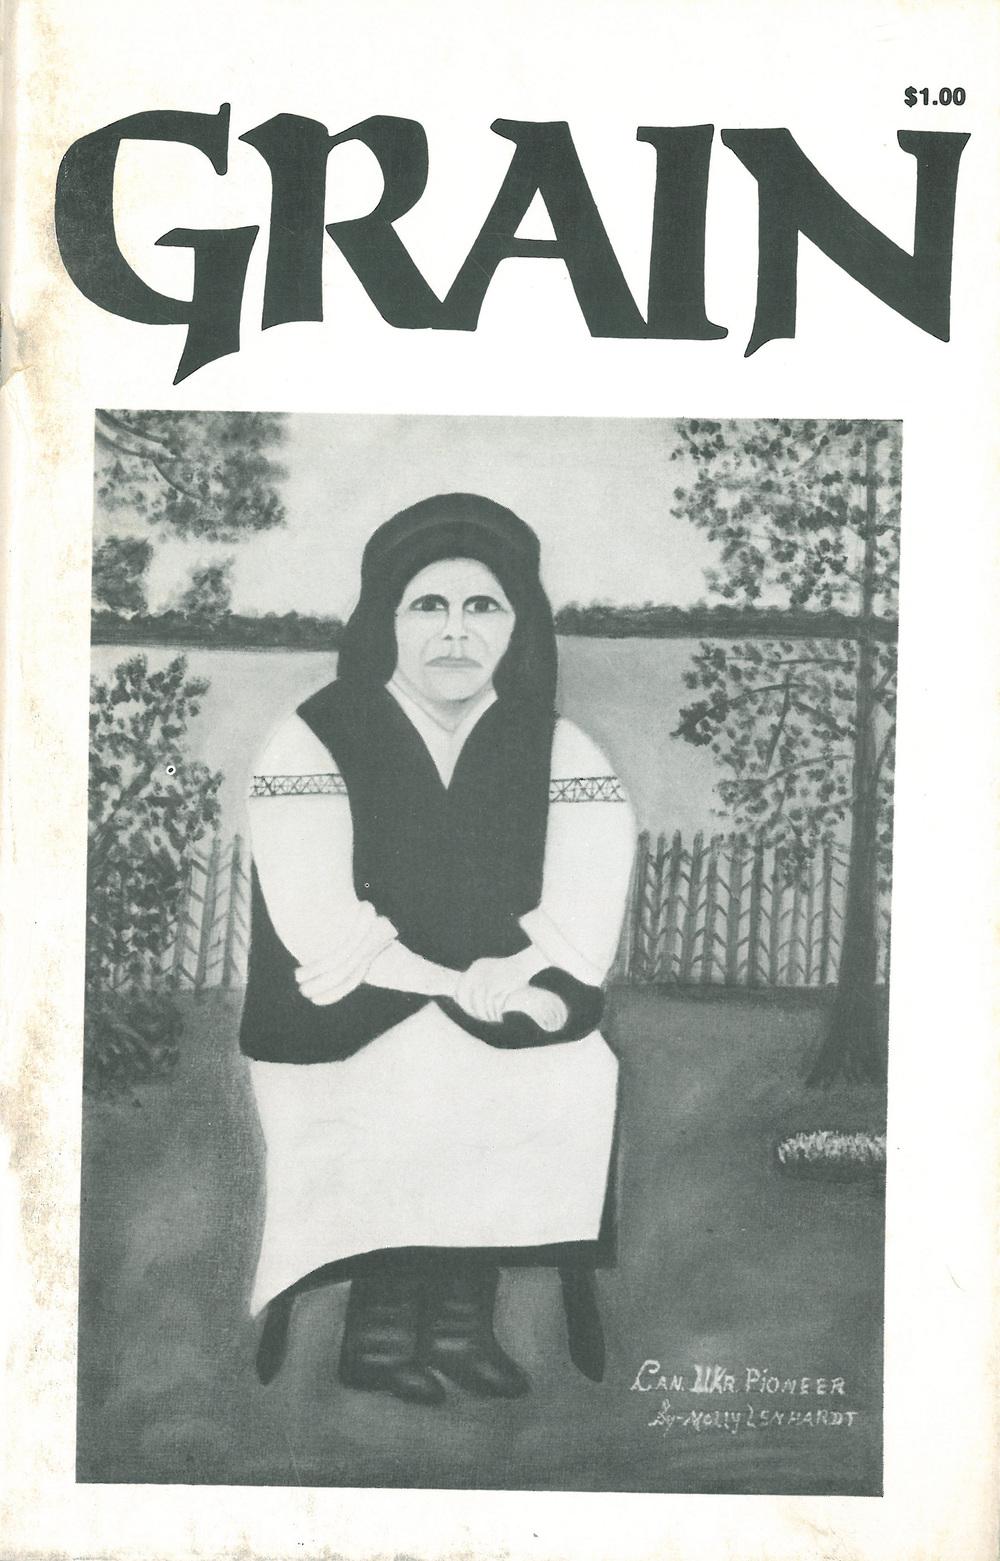 6.2 June 1978